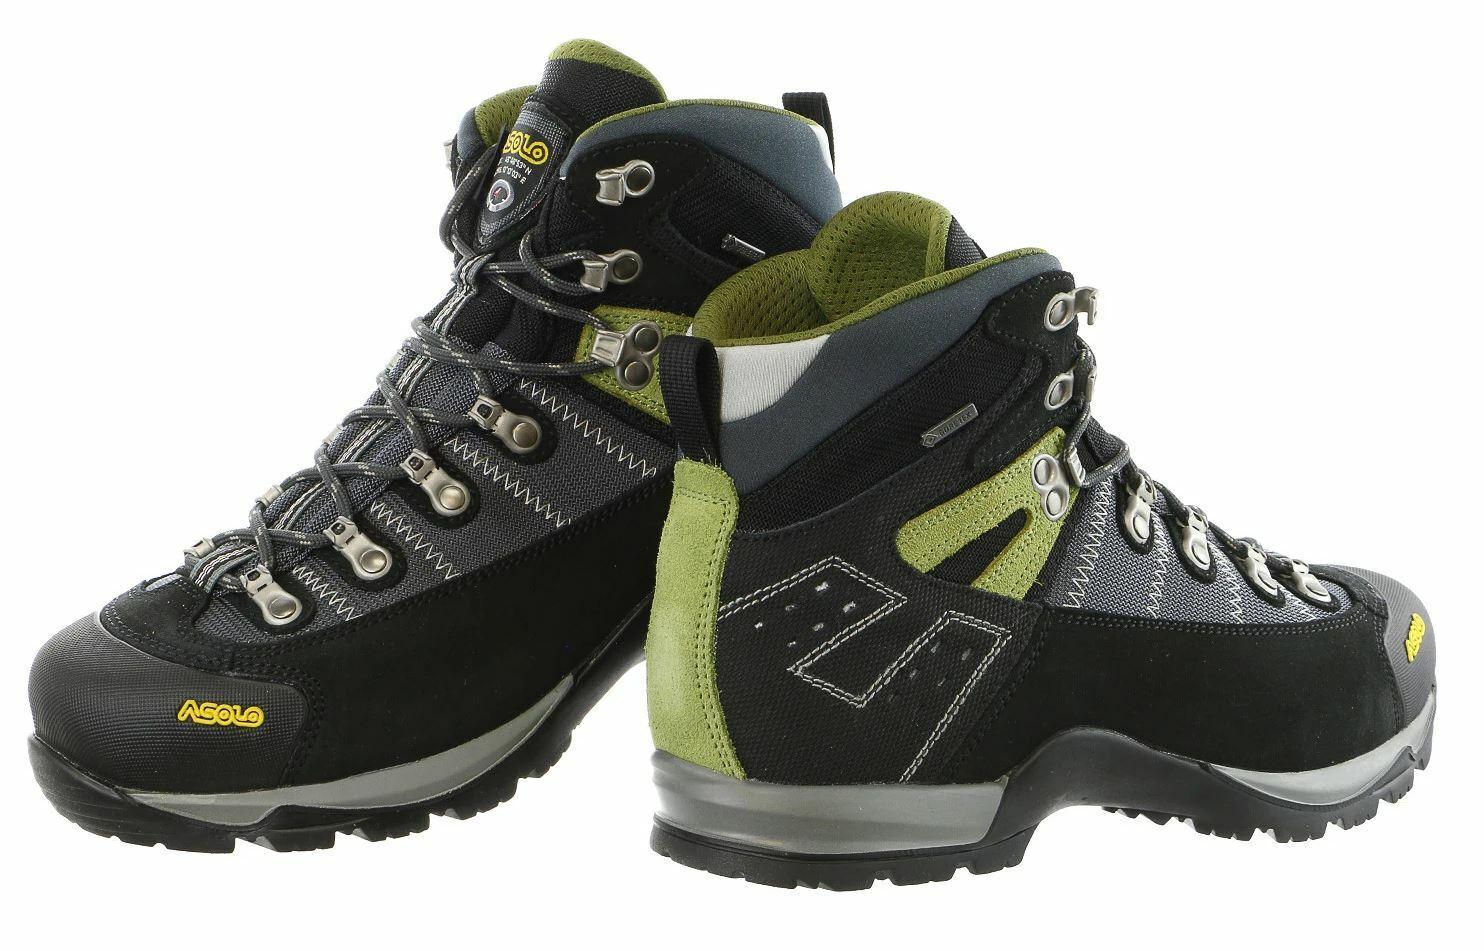 fugitive gtx hiking boot mens us 8